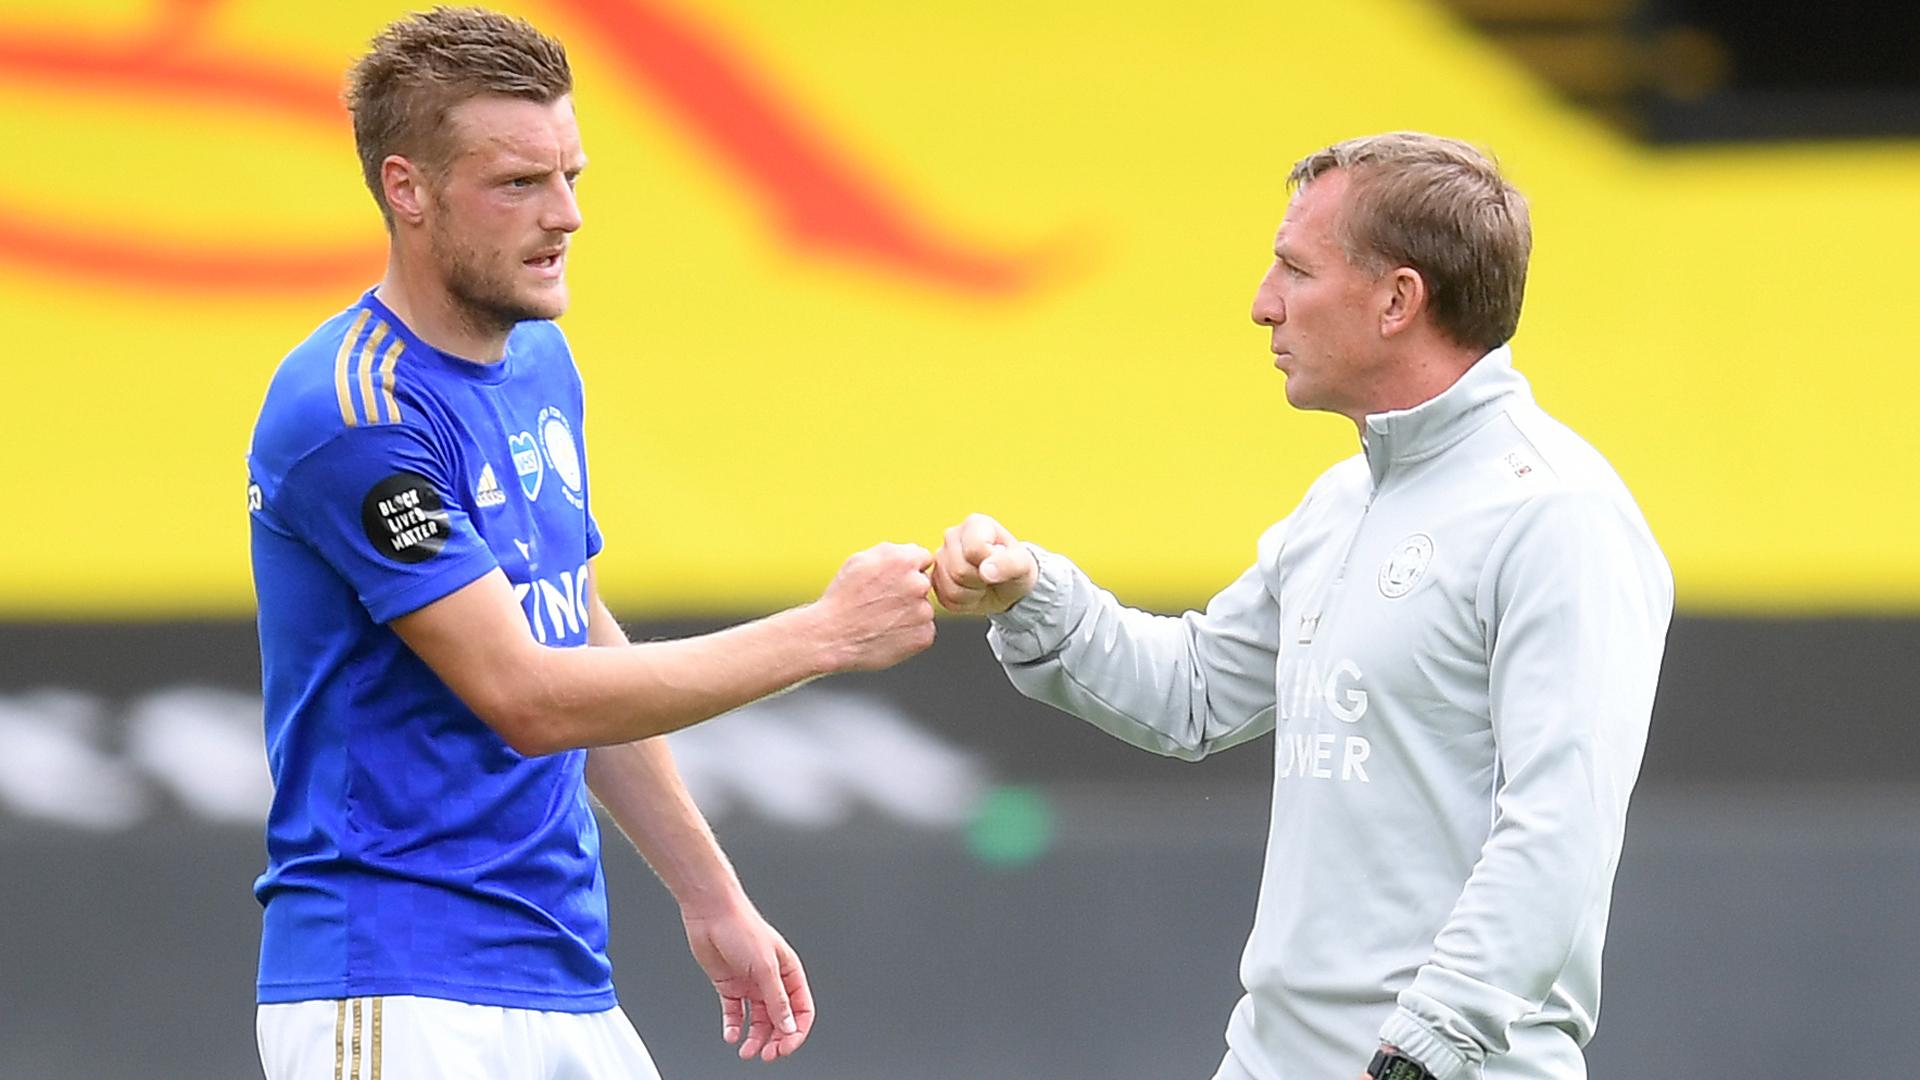 Amid Leicester City's goalscoring struggles, Brendan Rodgers backed forward Jamie Vardy.